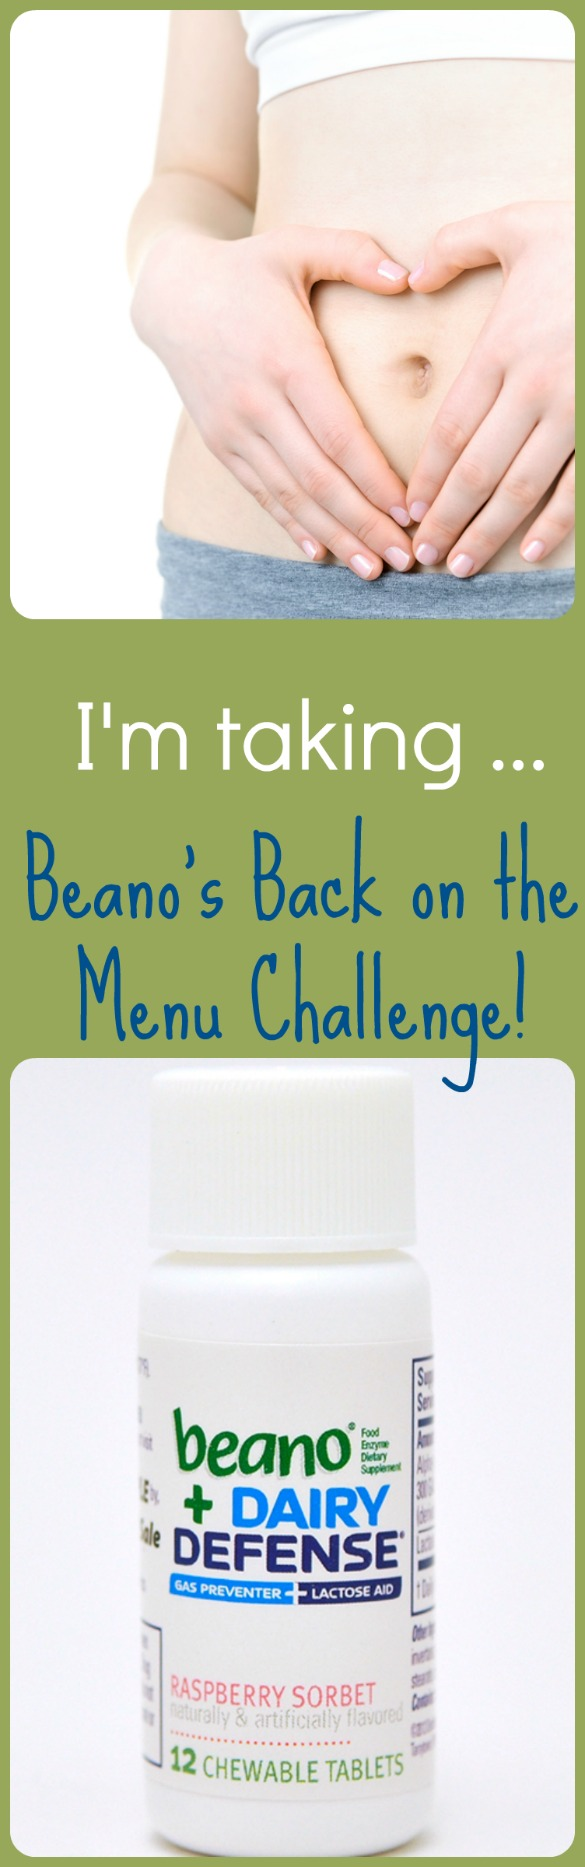 beano-challenge